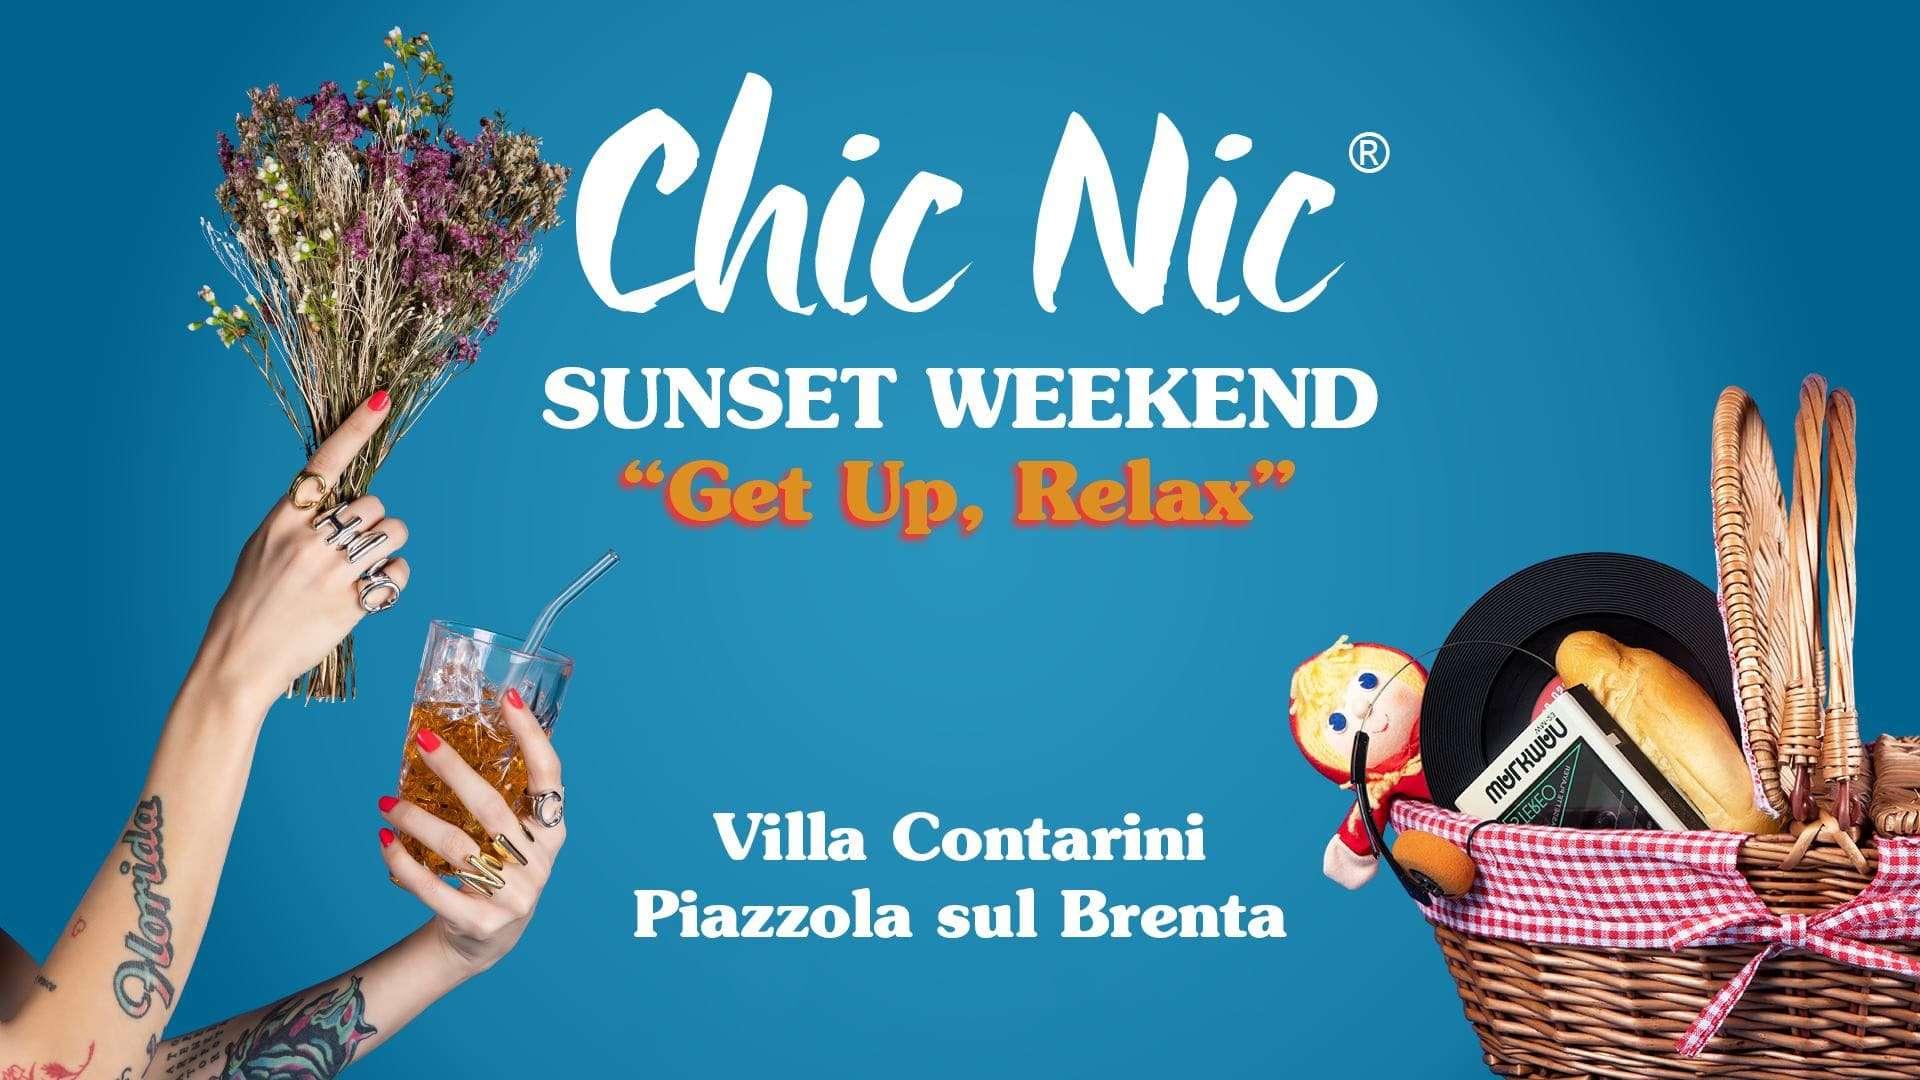 Chic Nic Sunset Weekend - Villa Contarini, Piazzola sul Brenta